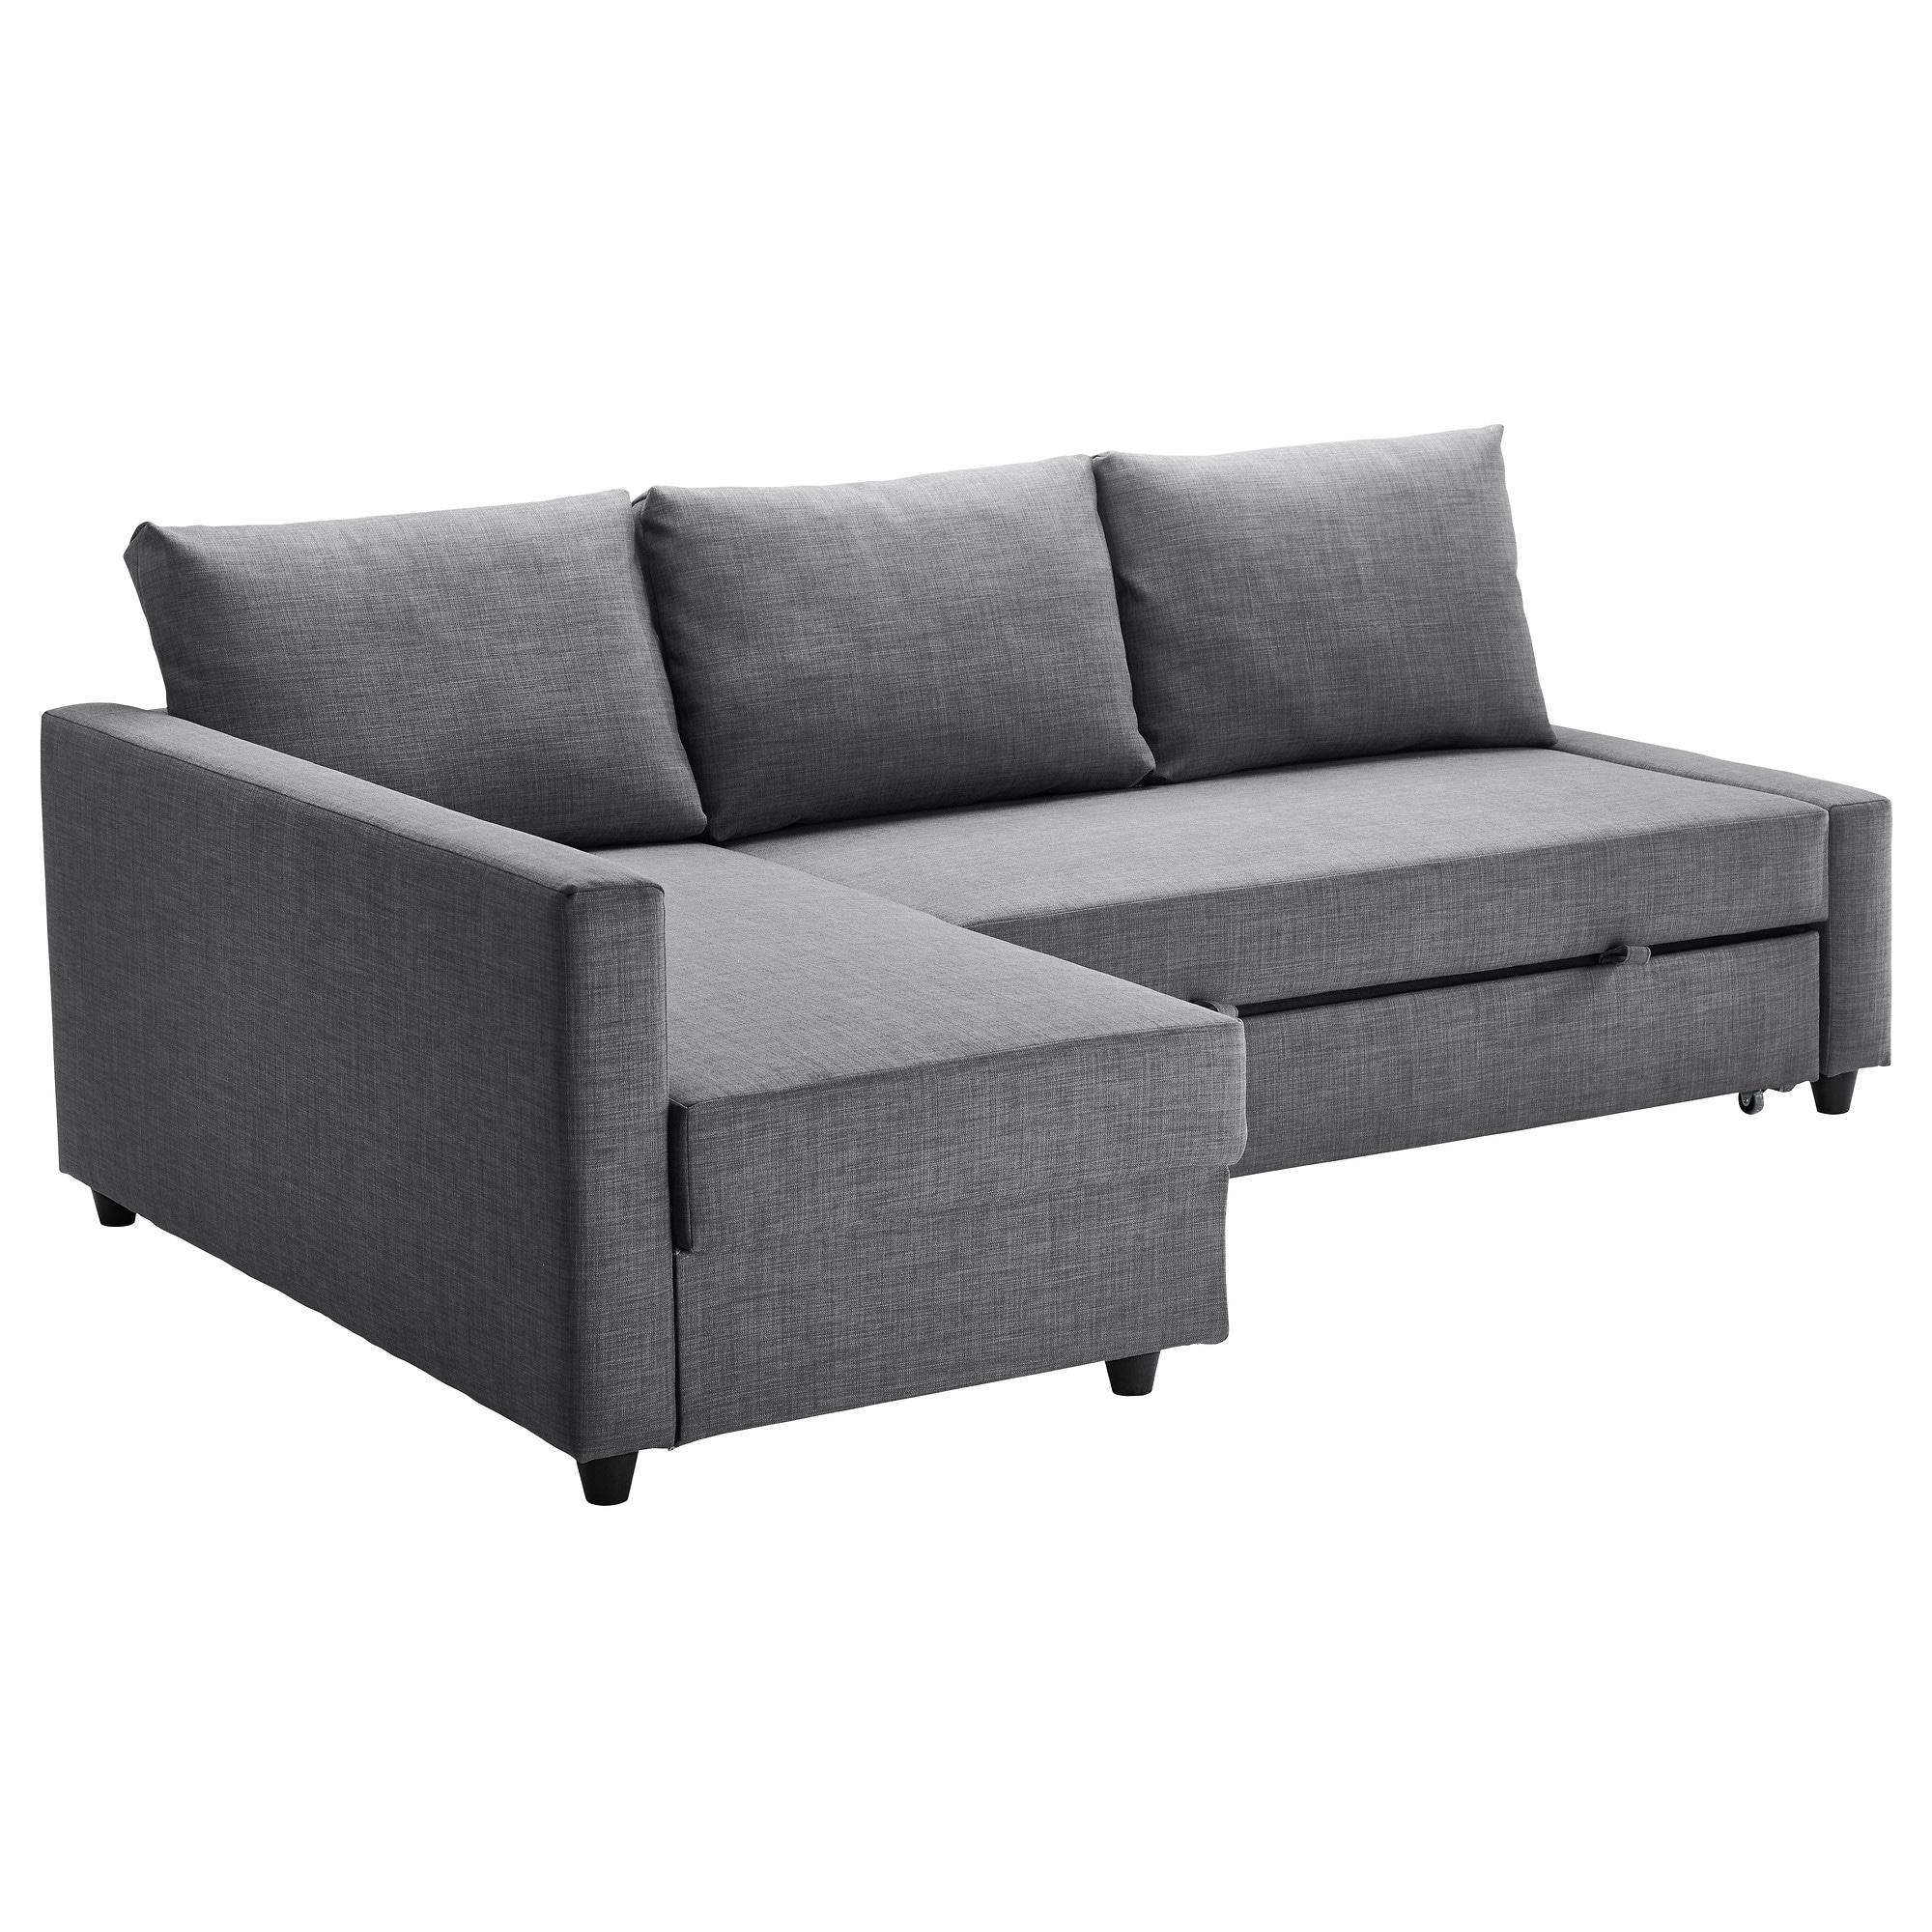 Sofa Cama Merkamueble Rldj sofà S Cama De Calidad Pra Online Ikea